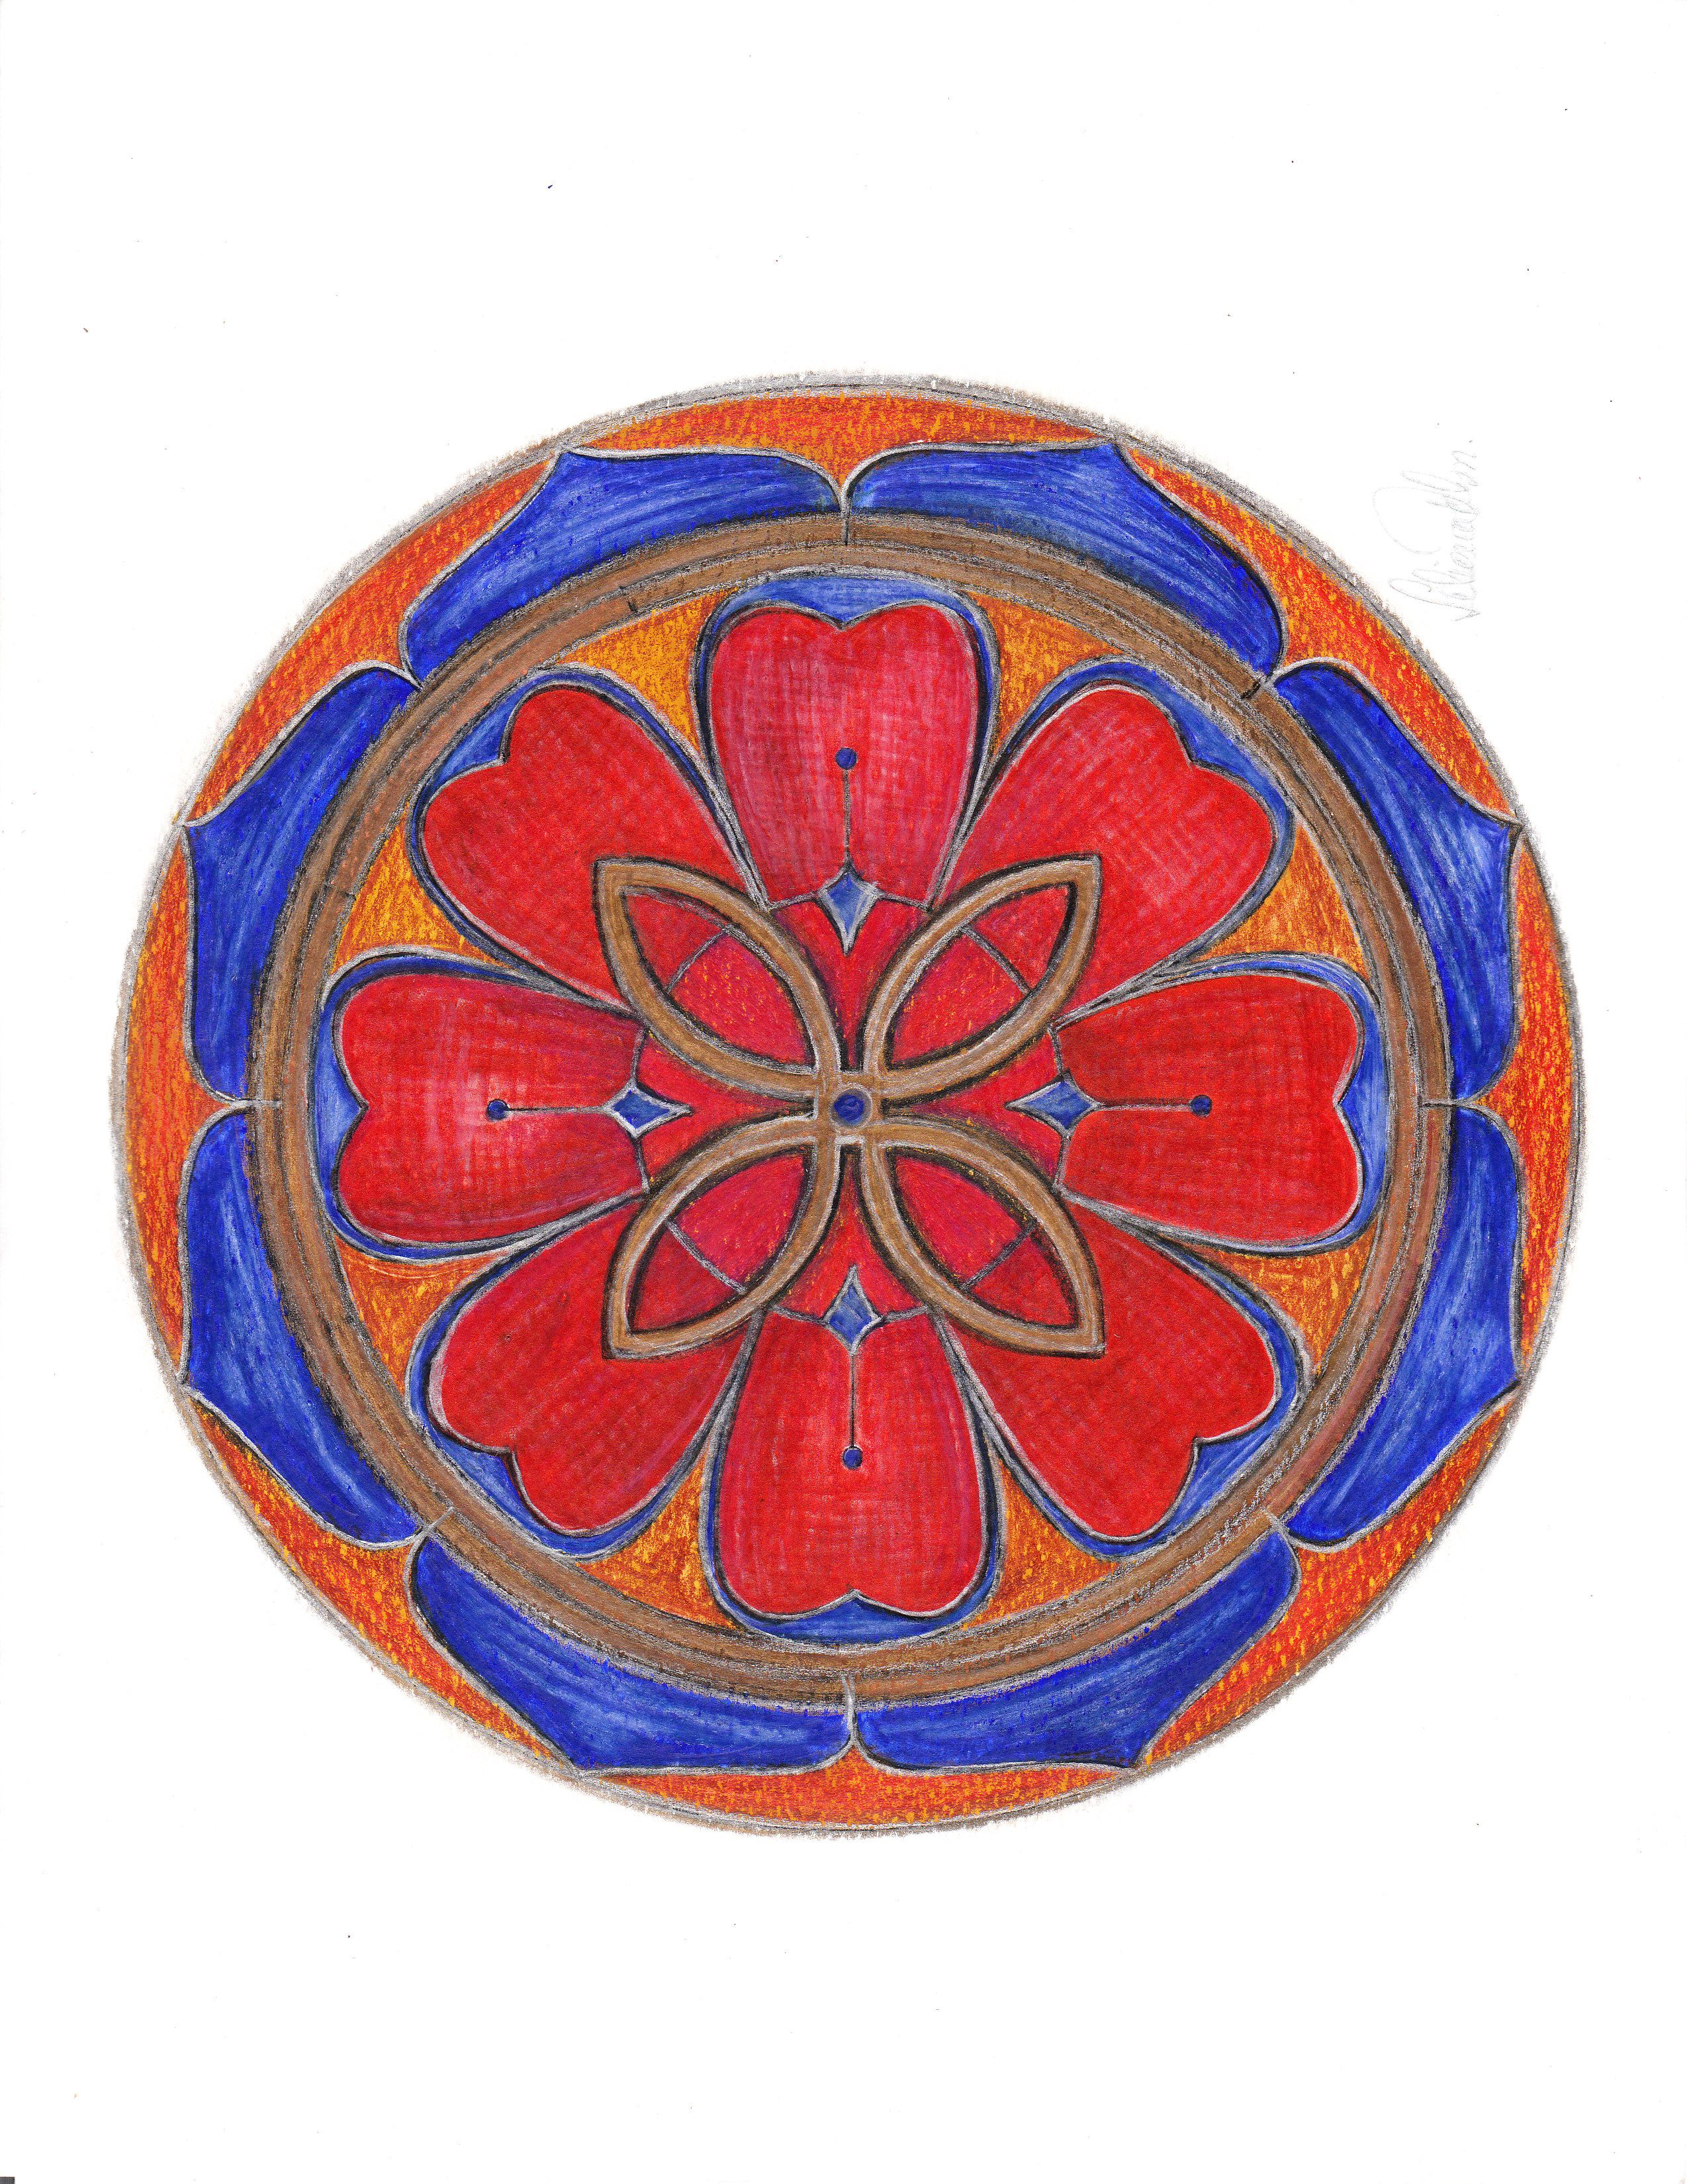 8 flower petals flor de 8 ptalos doublet of positive symbols 8 flower petals flor de 8 ptalos doublet of positive symbols has this mandala buycottarizona